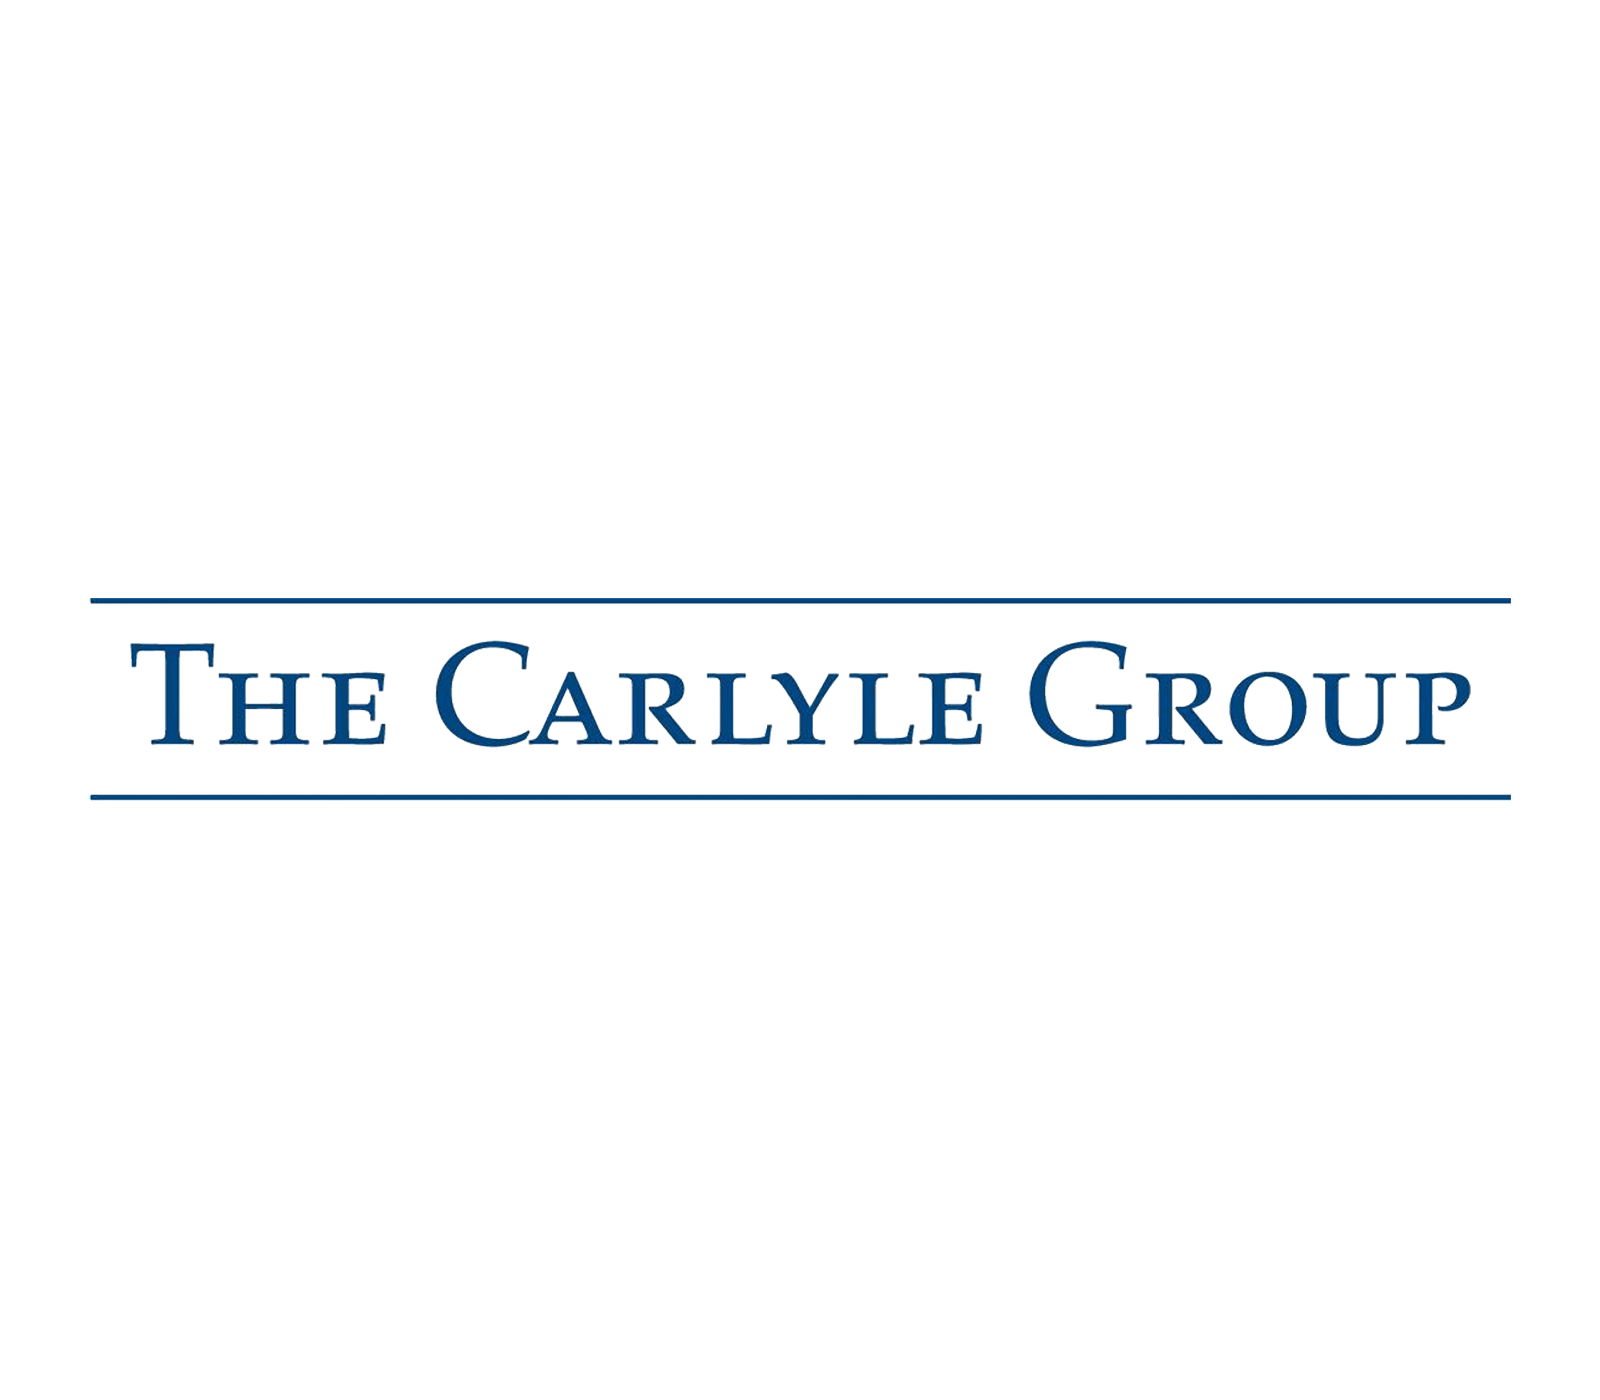 logo du fond  Carlyle Group